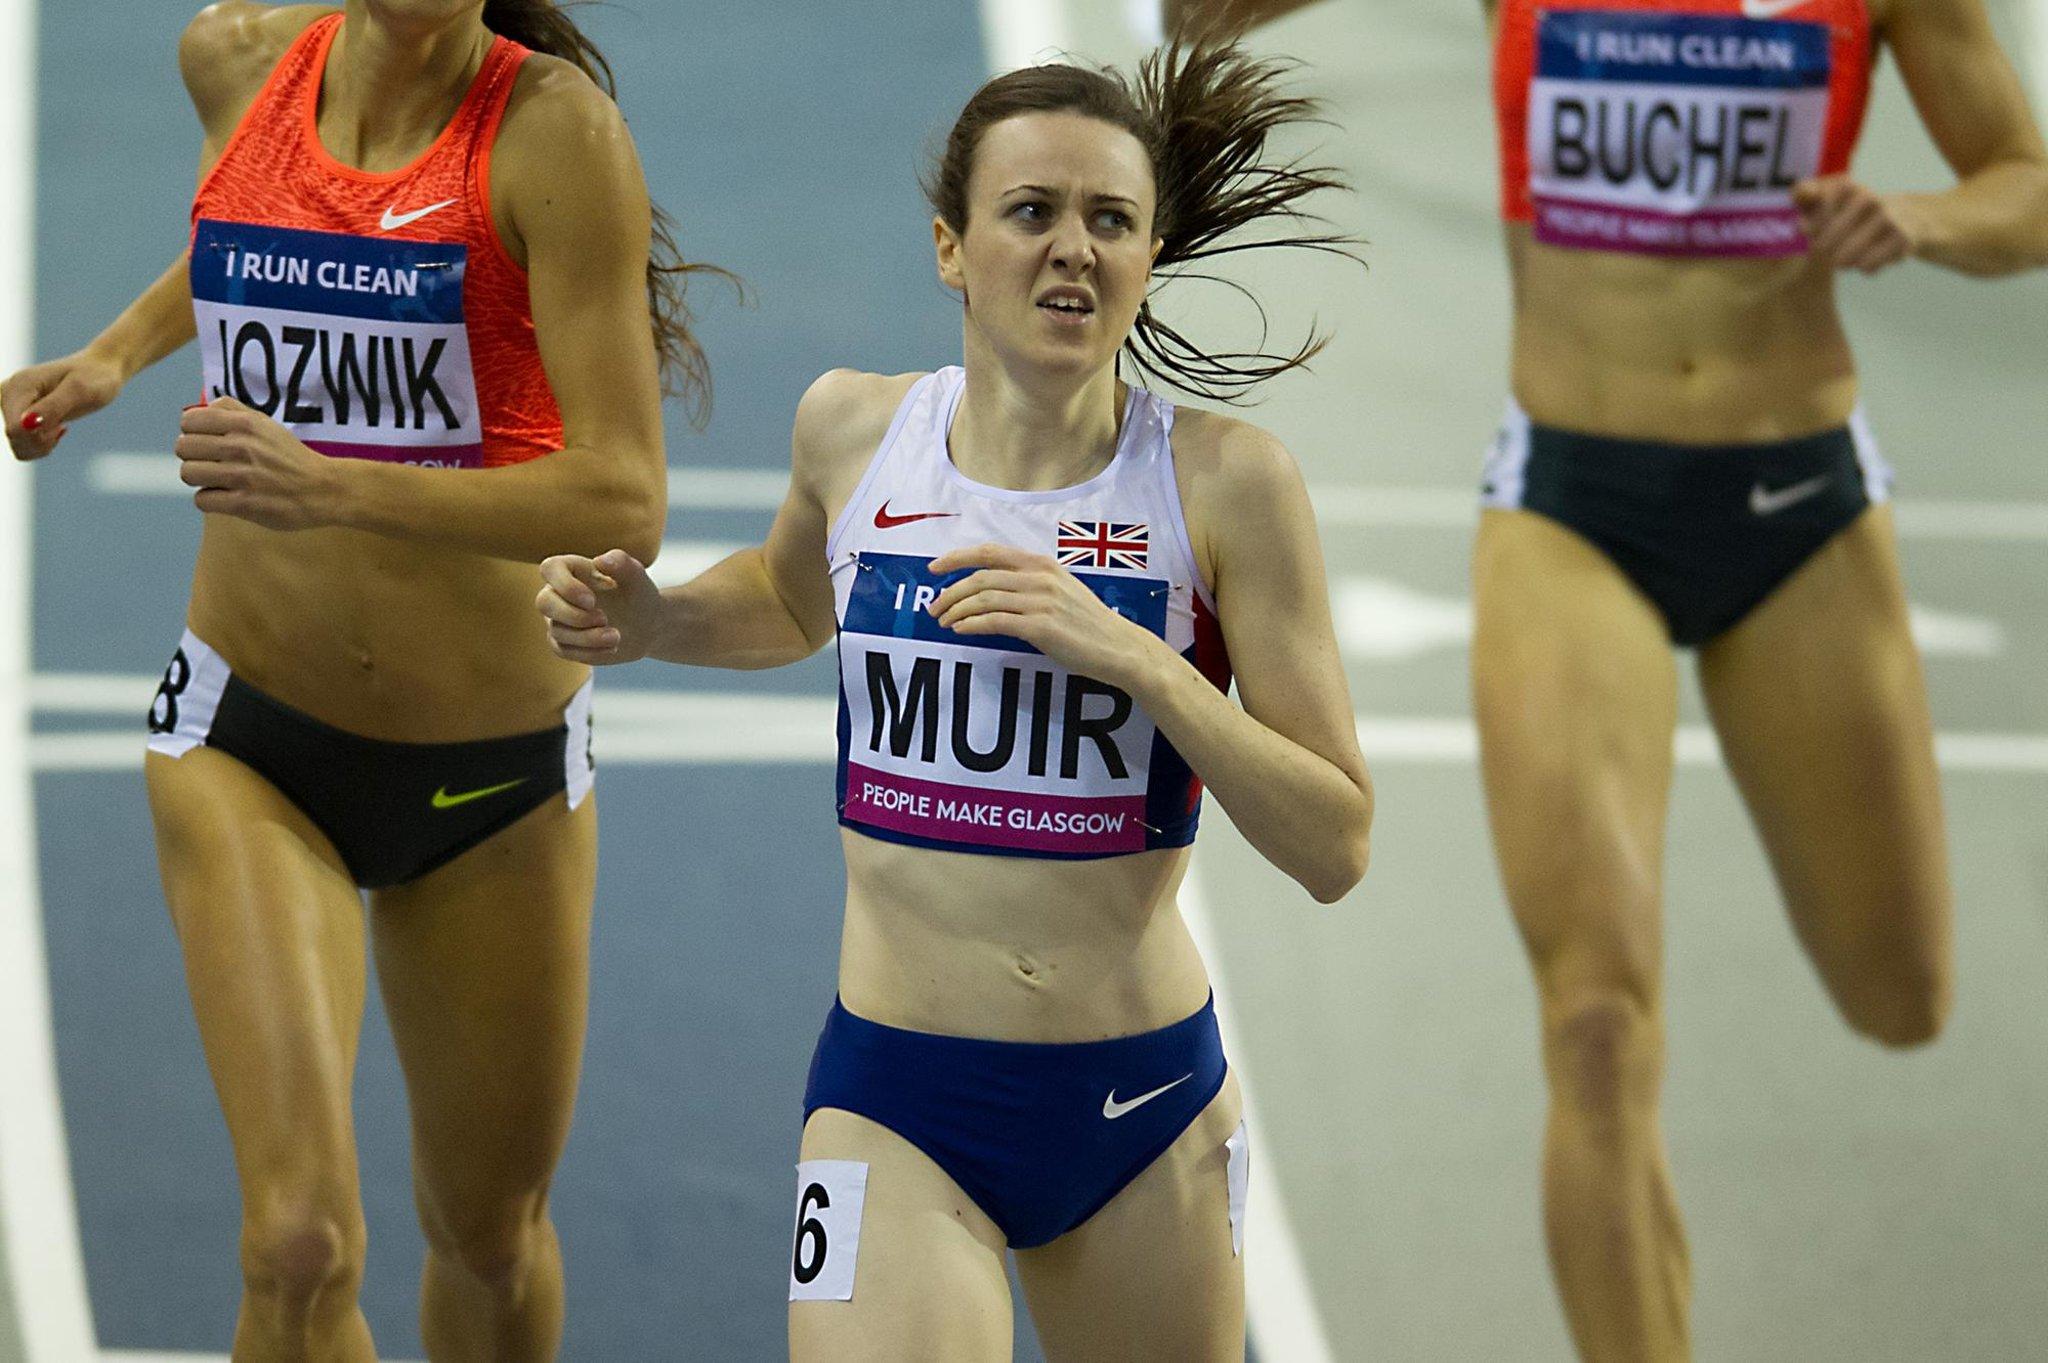 Laura Muir honoured to be part of Team Scotland